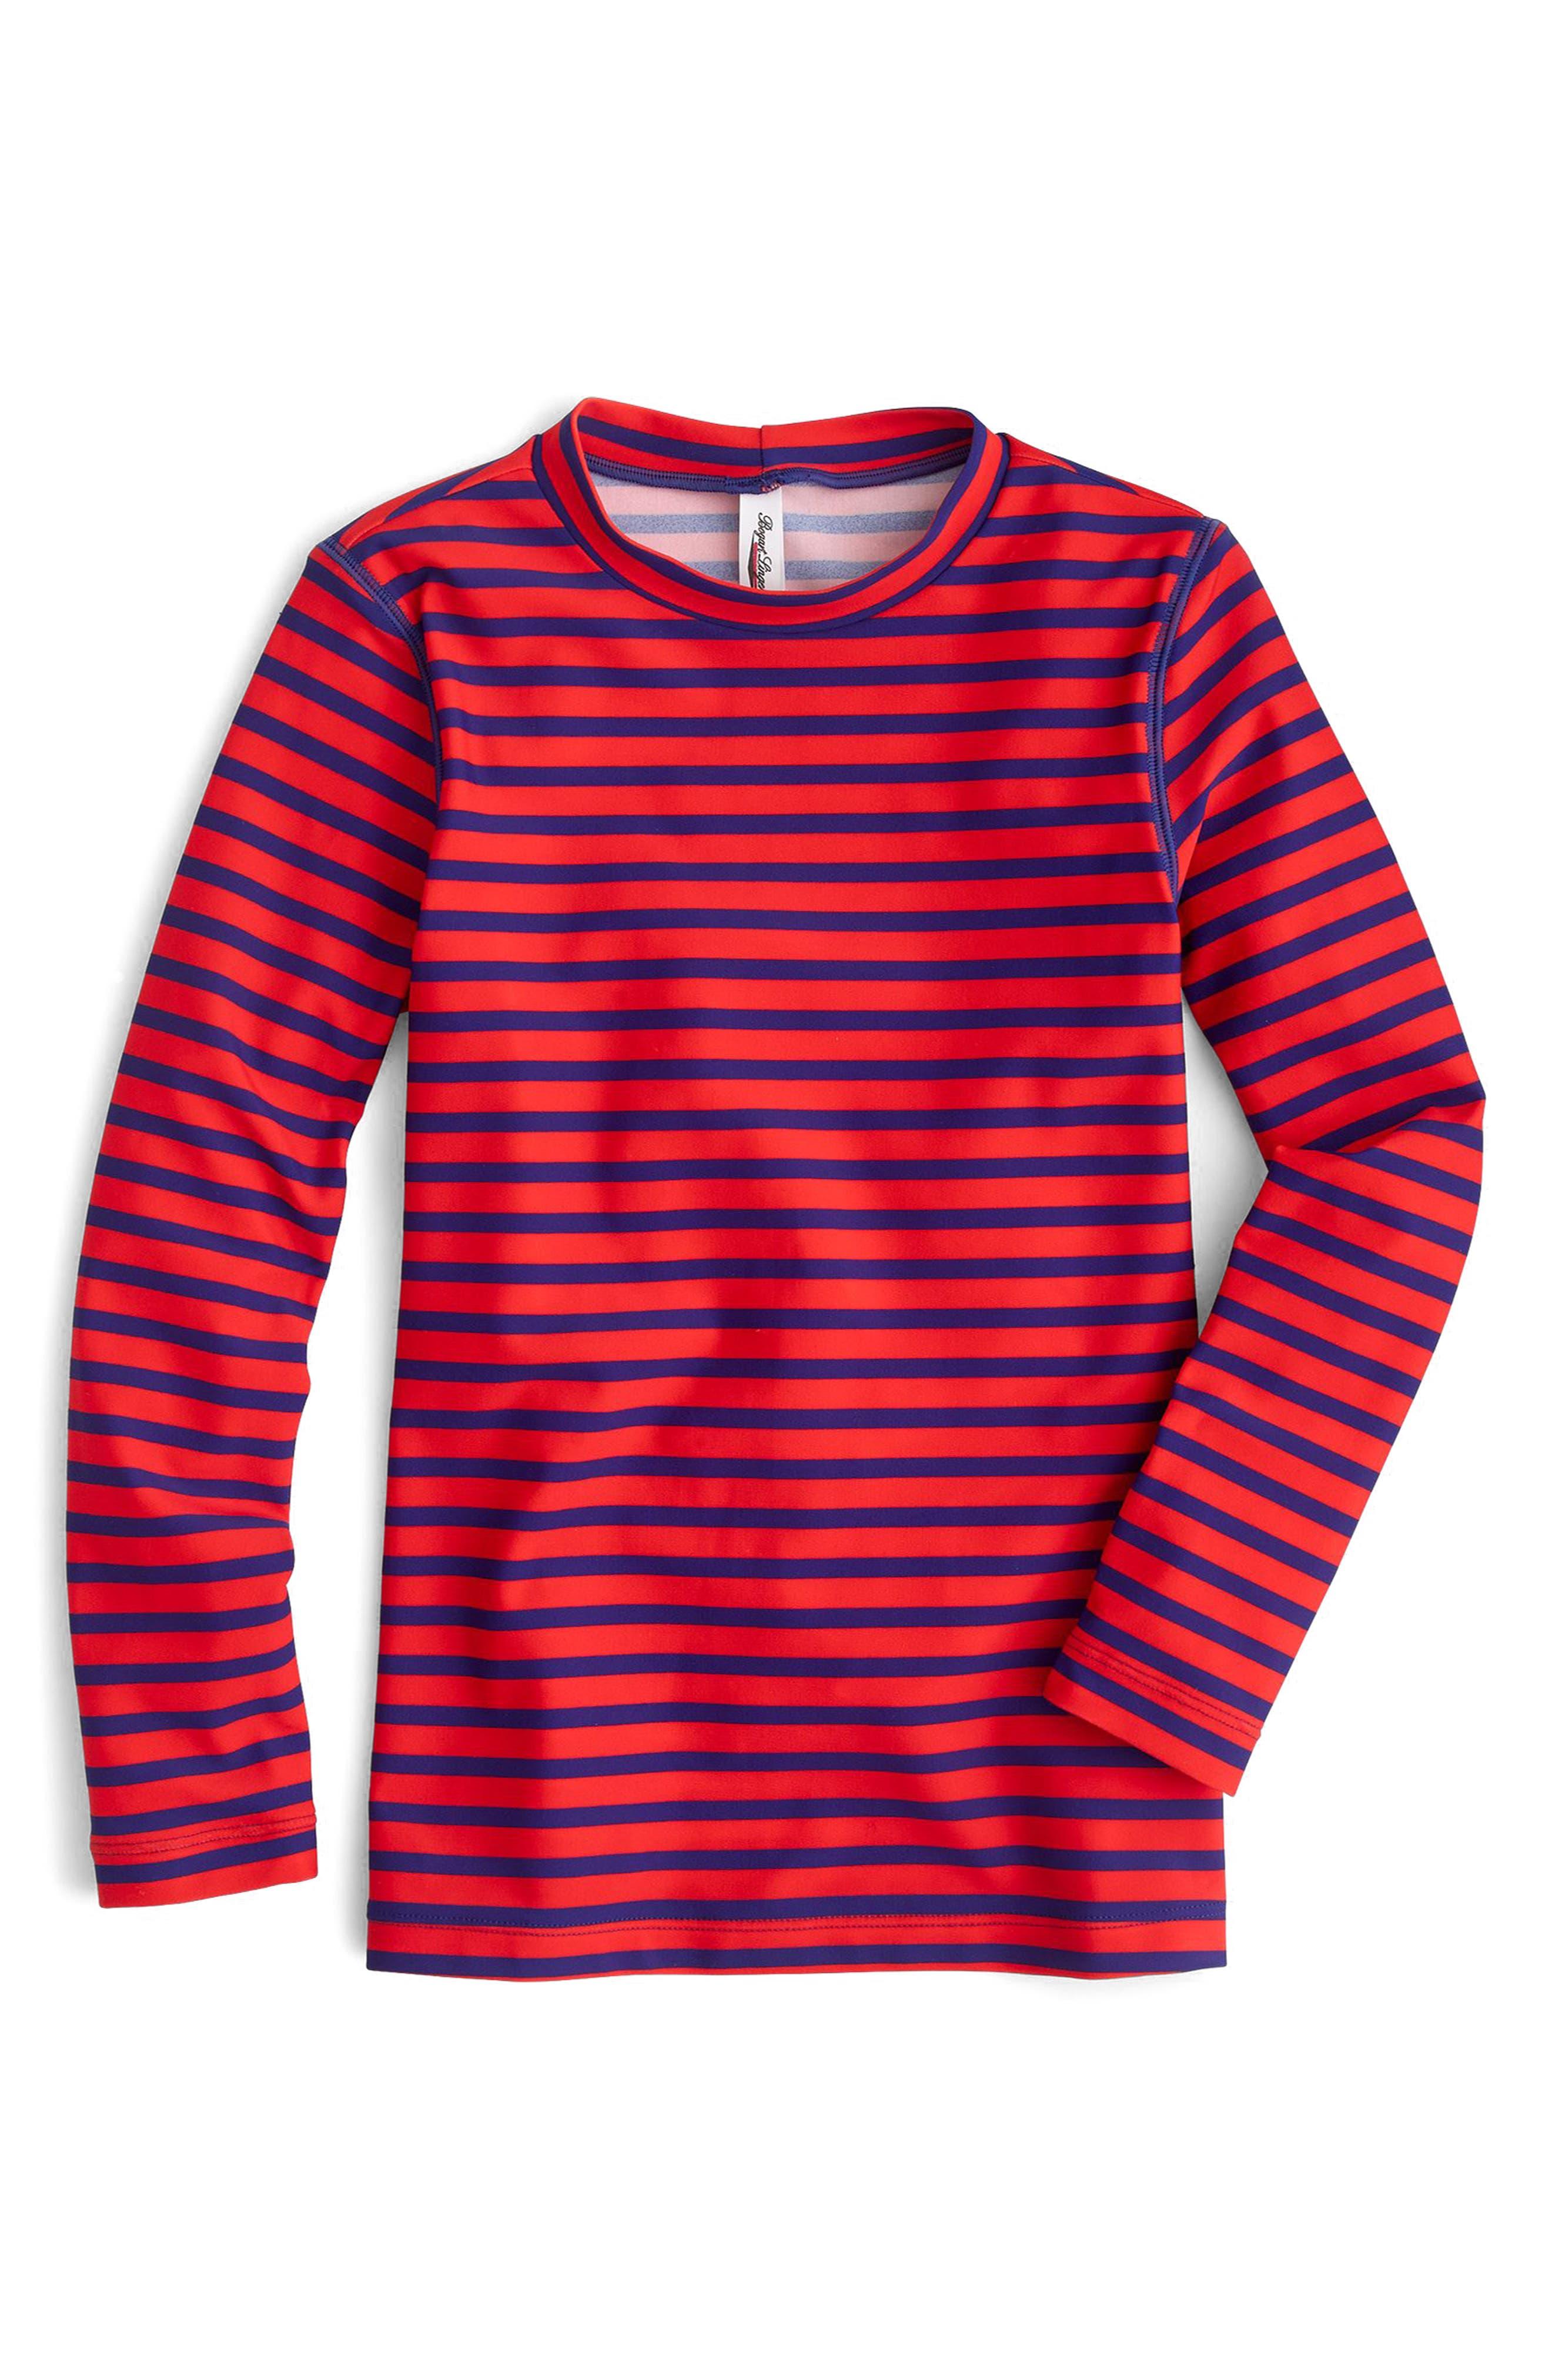 Stripe Long Sleeve Rashguard,                         Main,                         color, Indigo Flame